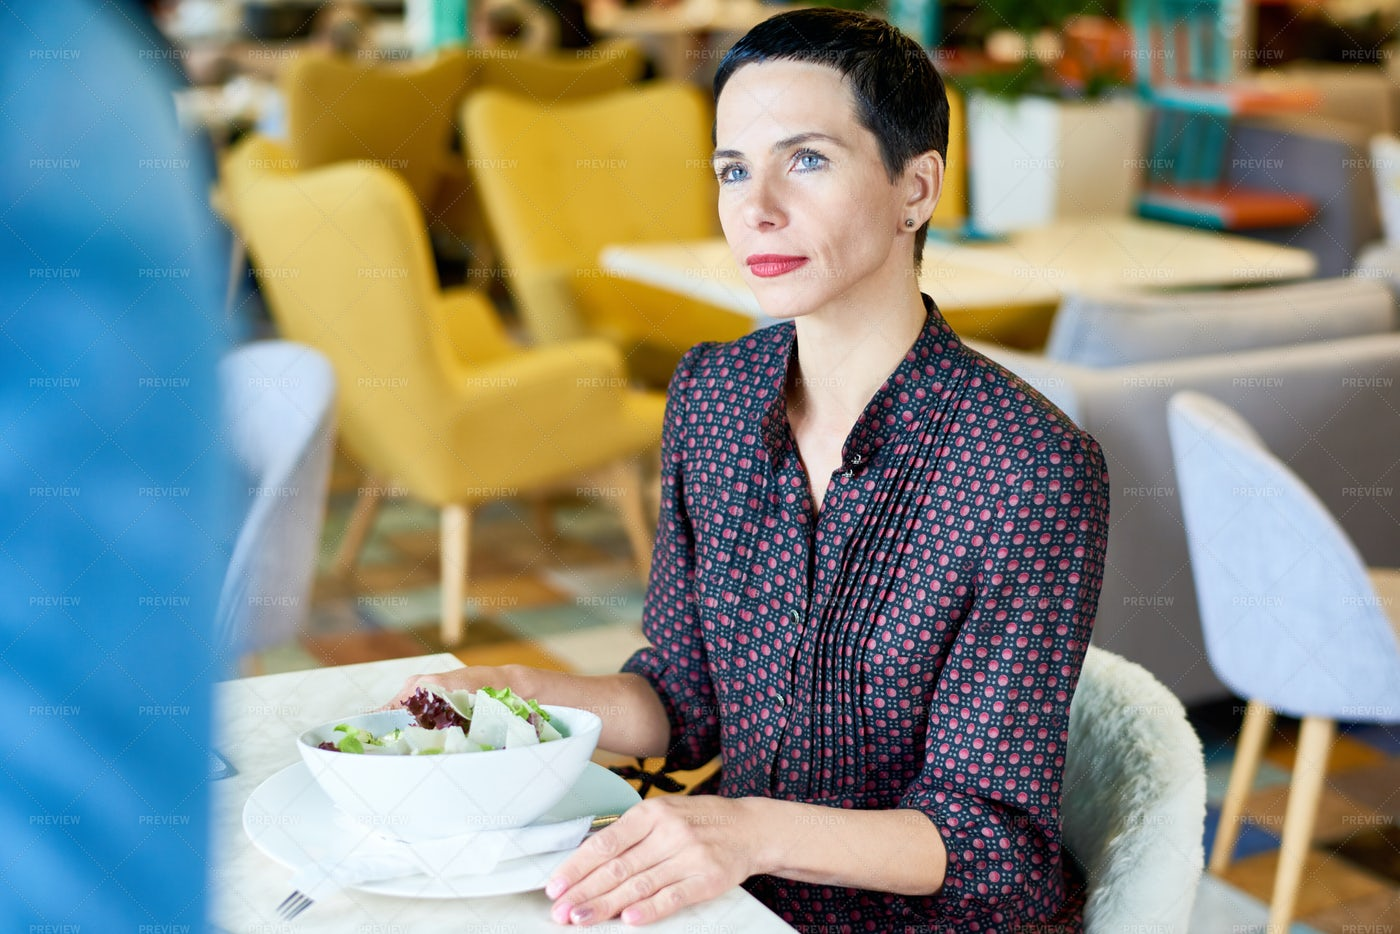 Elegant Woman At Cafe Table: Stock Photos